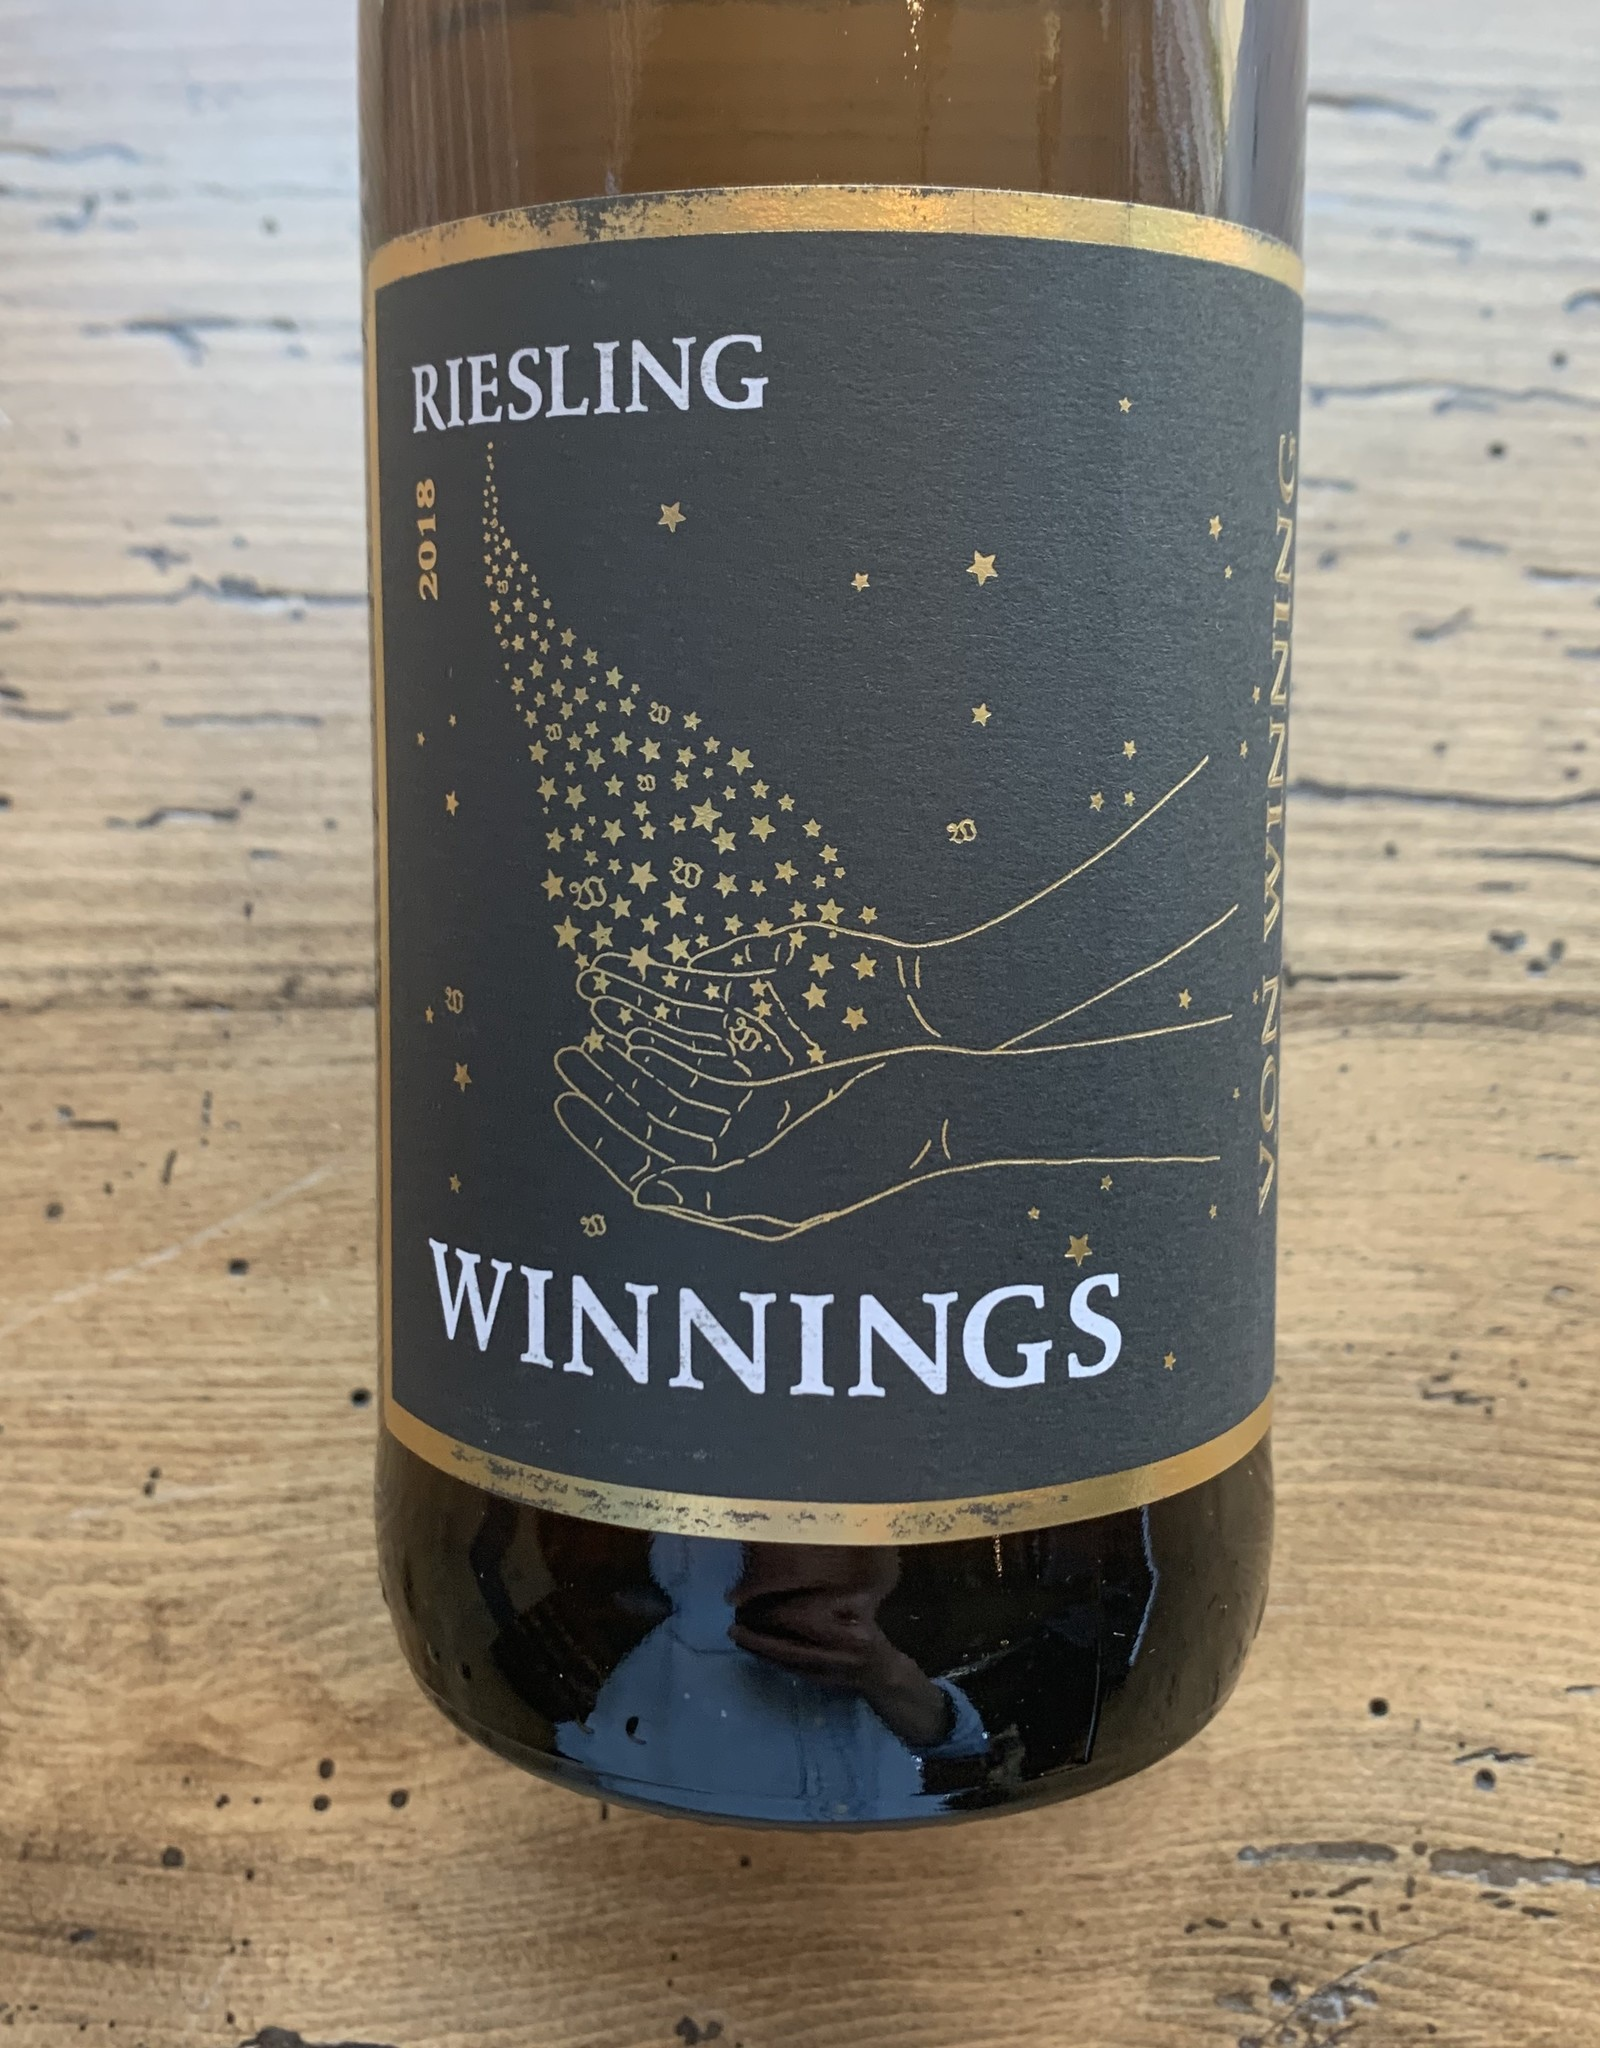 Von Winning Riesling Winnings